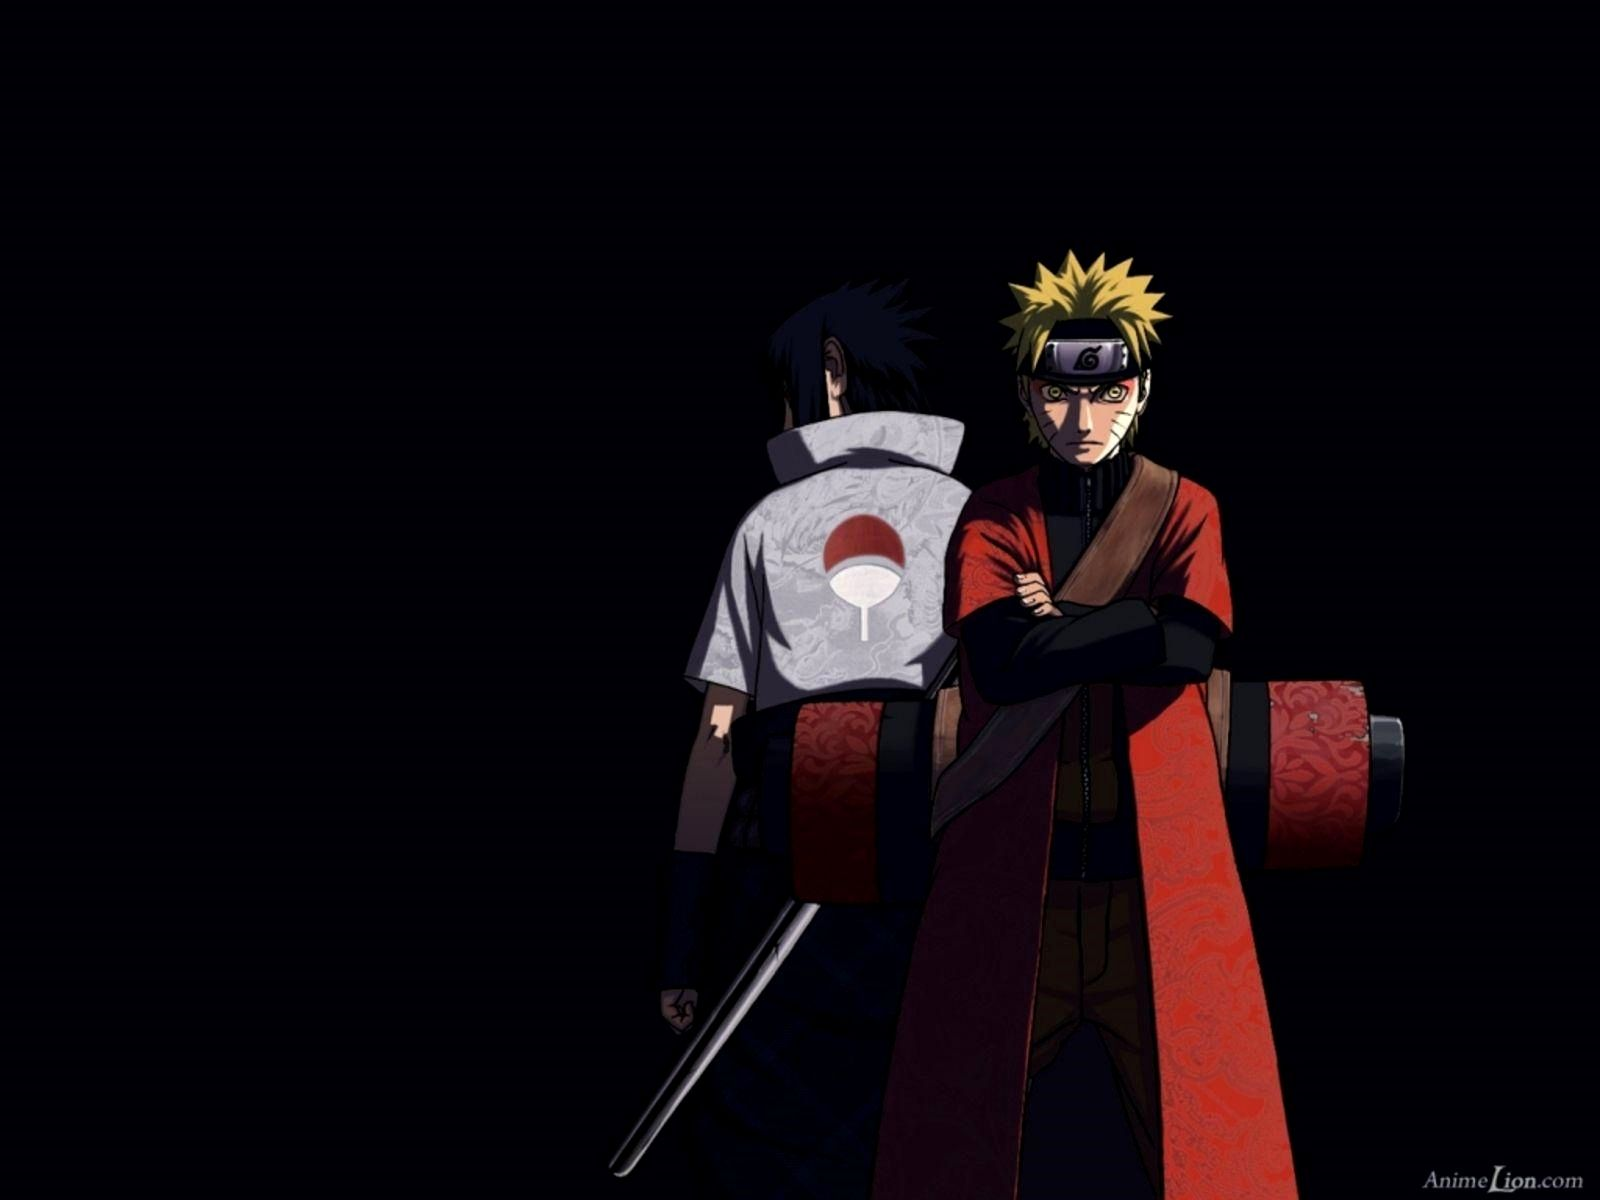 Naruto Dark Wallpaper 4k Gallery Naruto Wallpaper Wallpaper Naruto Shippuden Best Naruto Wallpapers